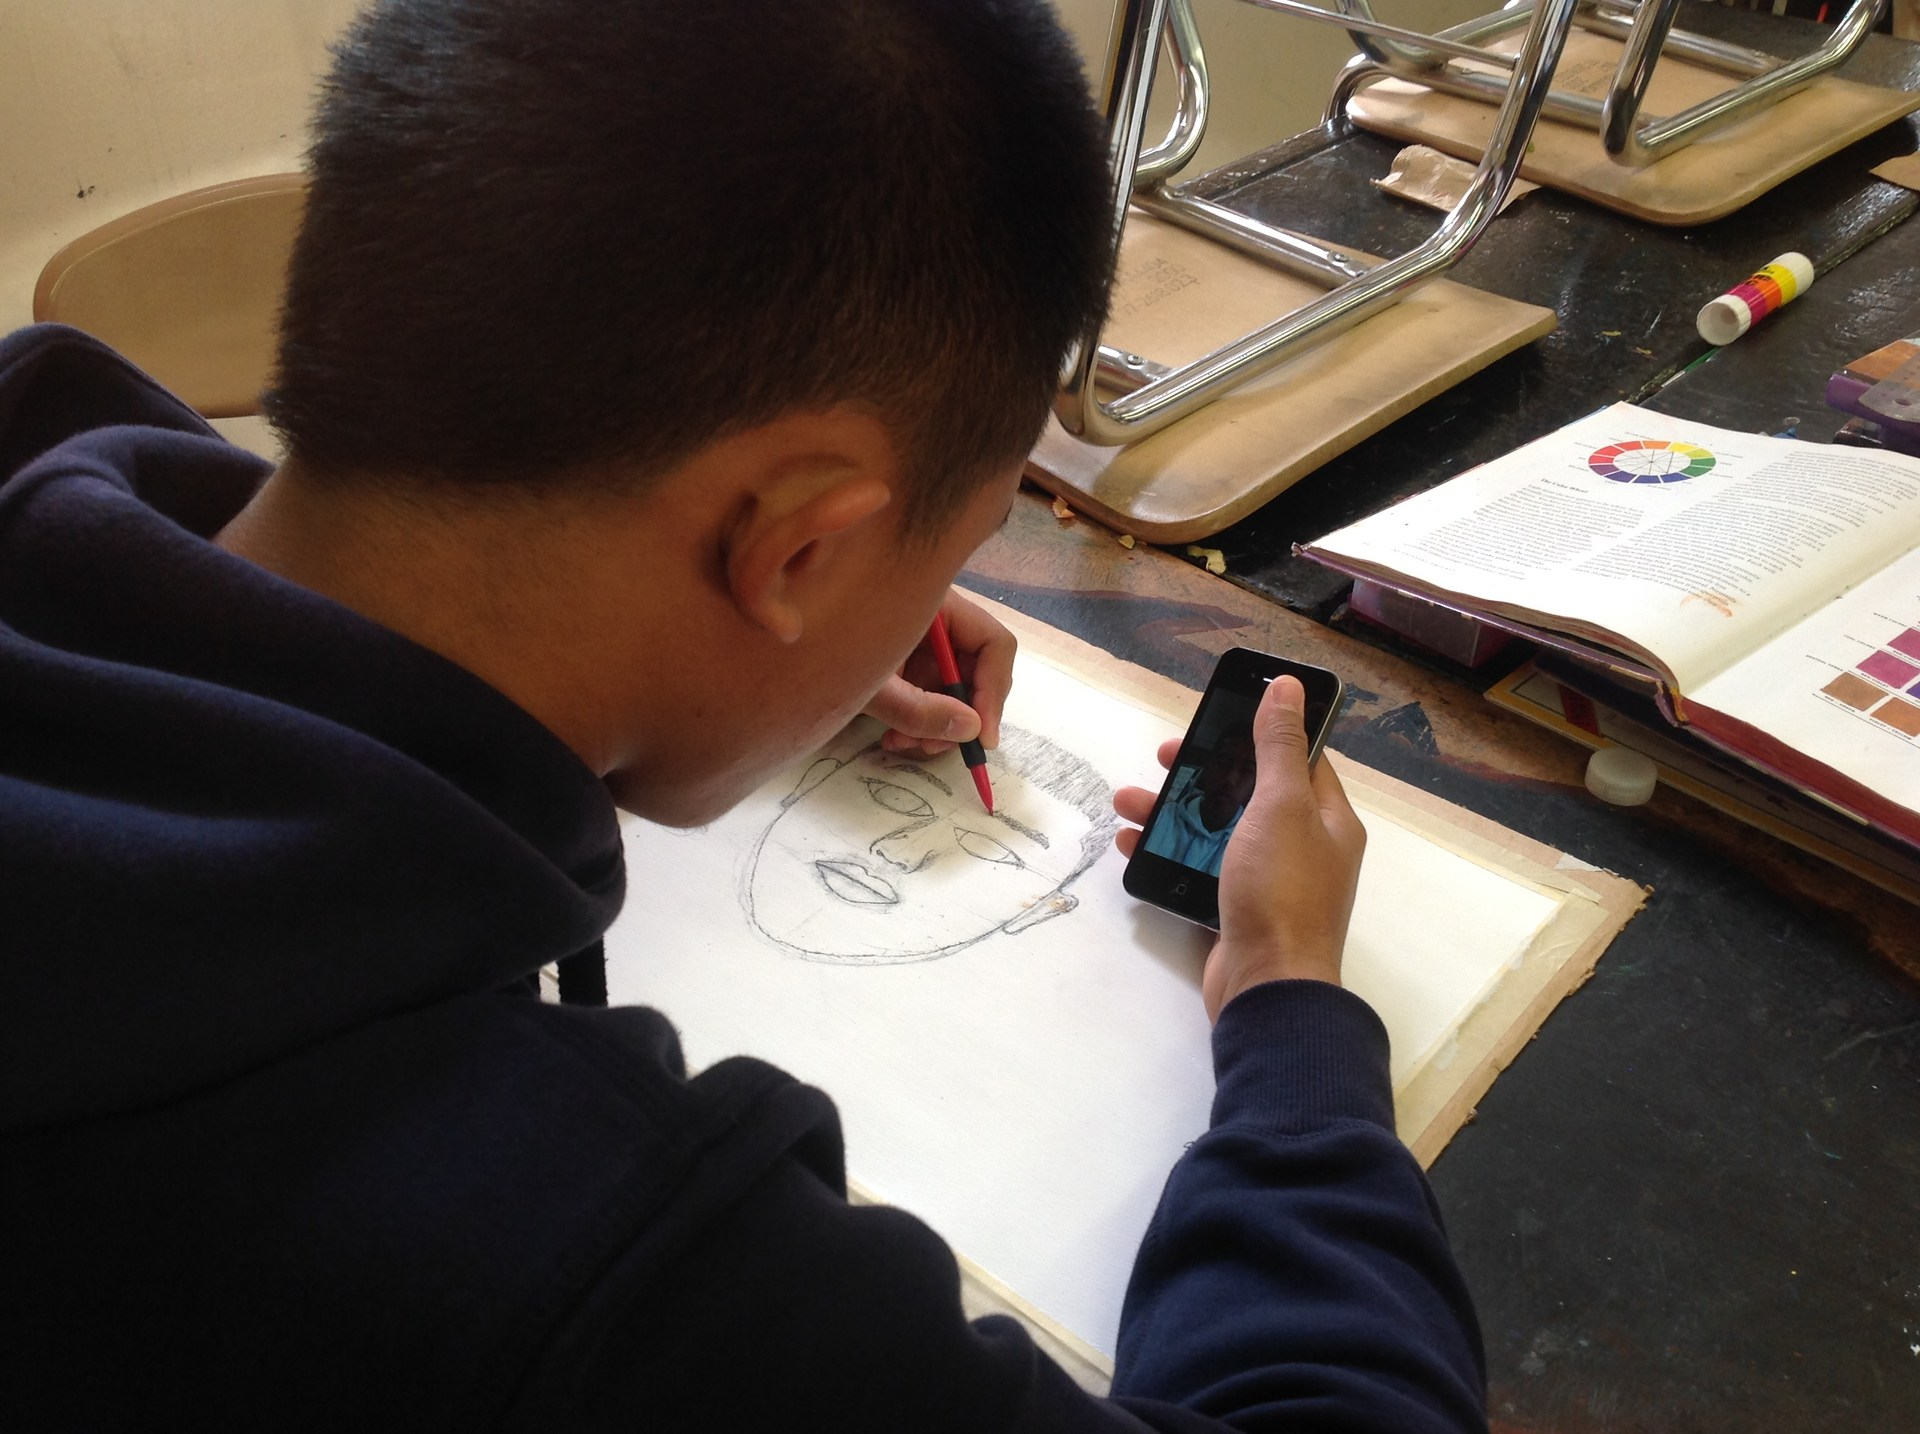 Student drawing portrait